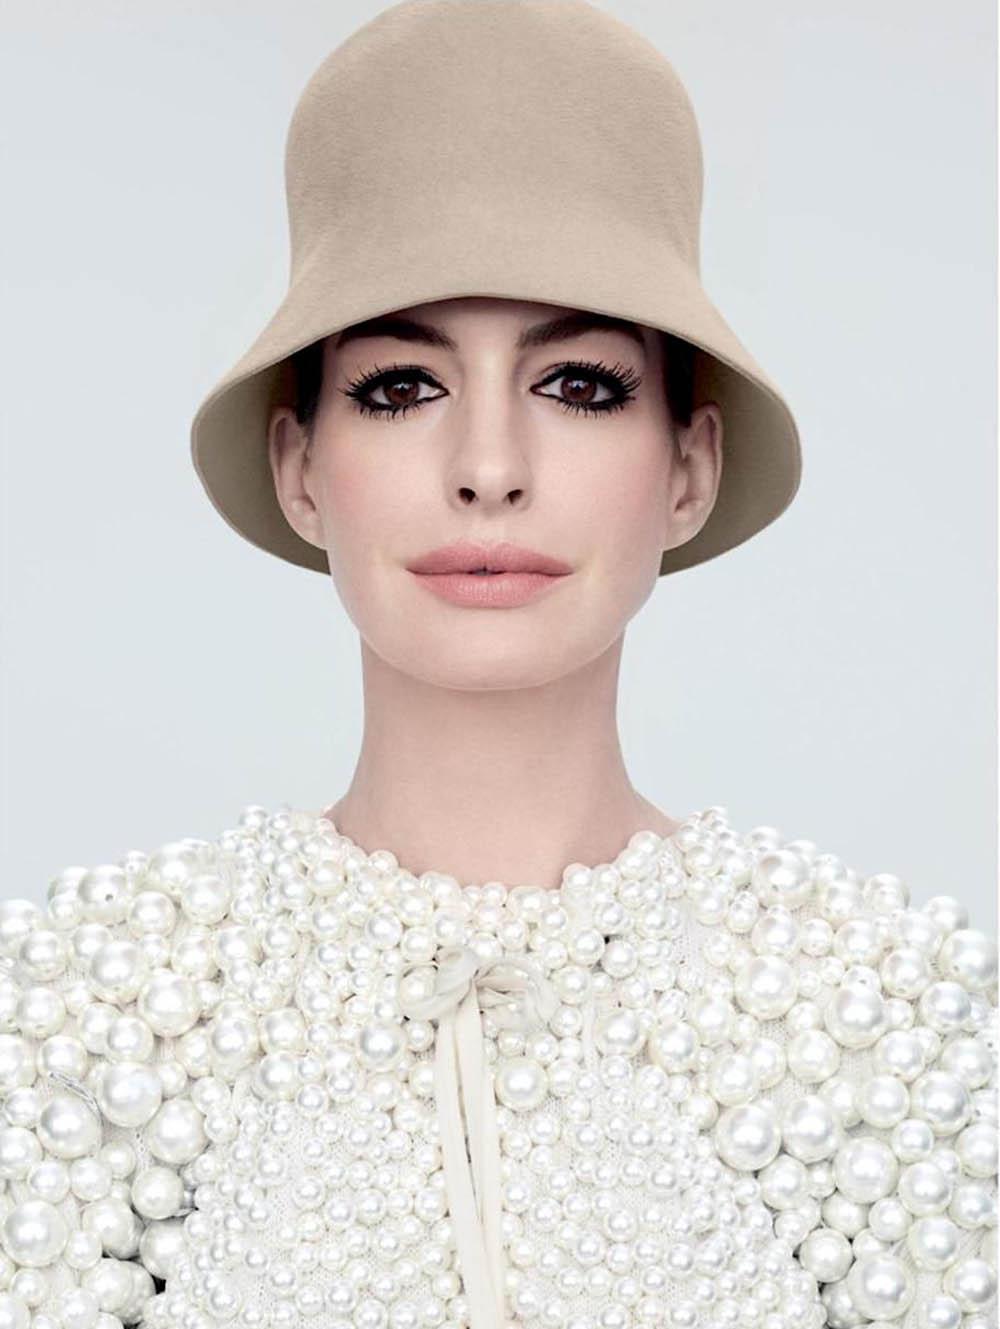 Anne Hathaway covers Allure US September 2019 by Sølve Sundsbø